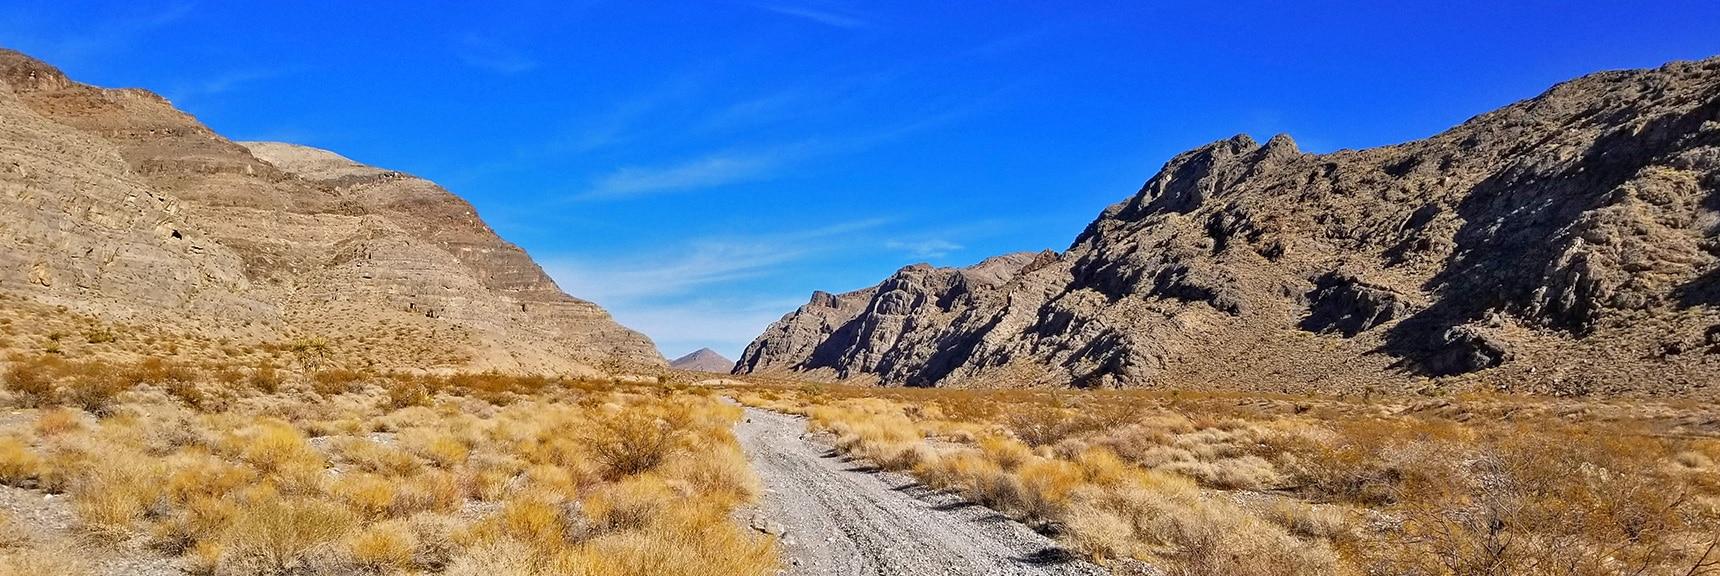 View Back Up Gass Peak North Las Vegas Pass | Gass Peak Road Circuit | Desert National Wildlife Refuge | Nevada